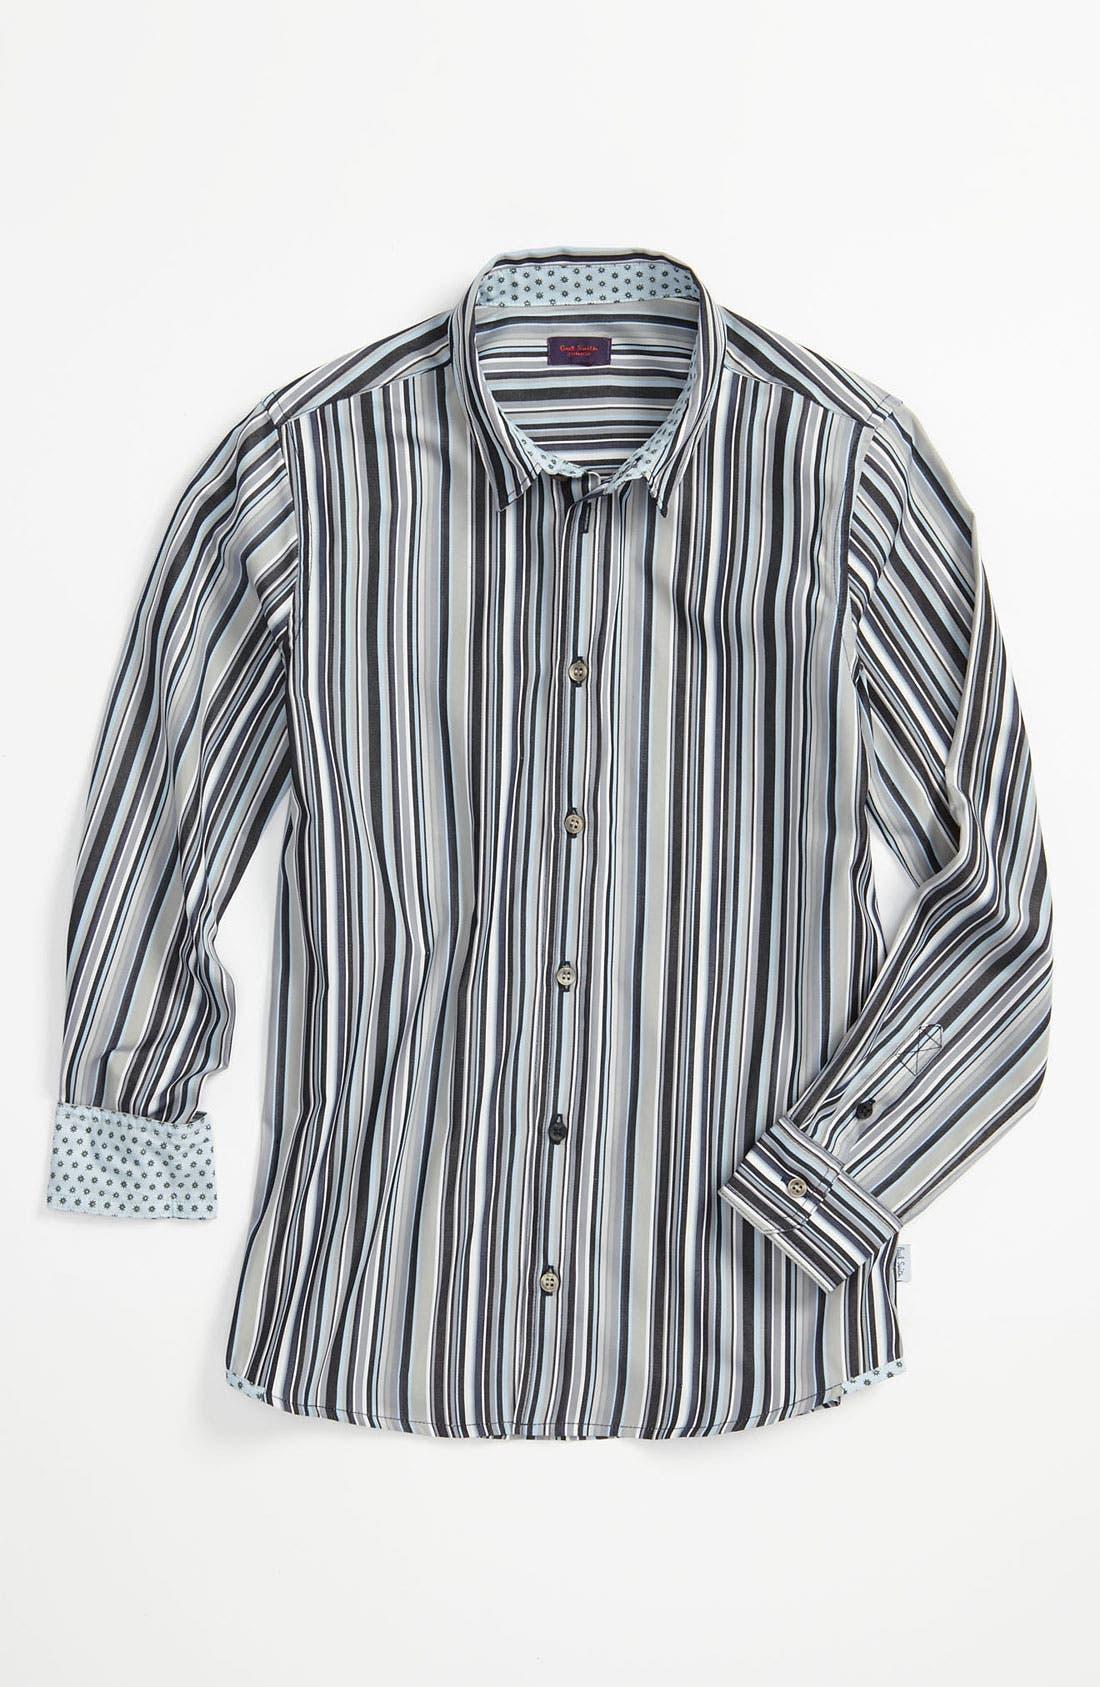 Alternate Image 1 Selected - Paul Smith Junior 'Cartland 2' Dress Shirt (Little Boys)